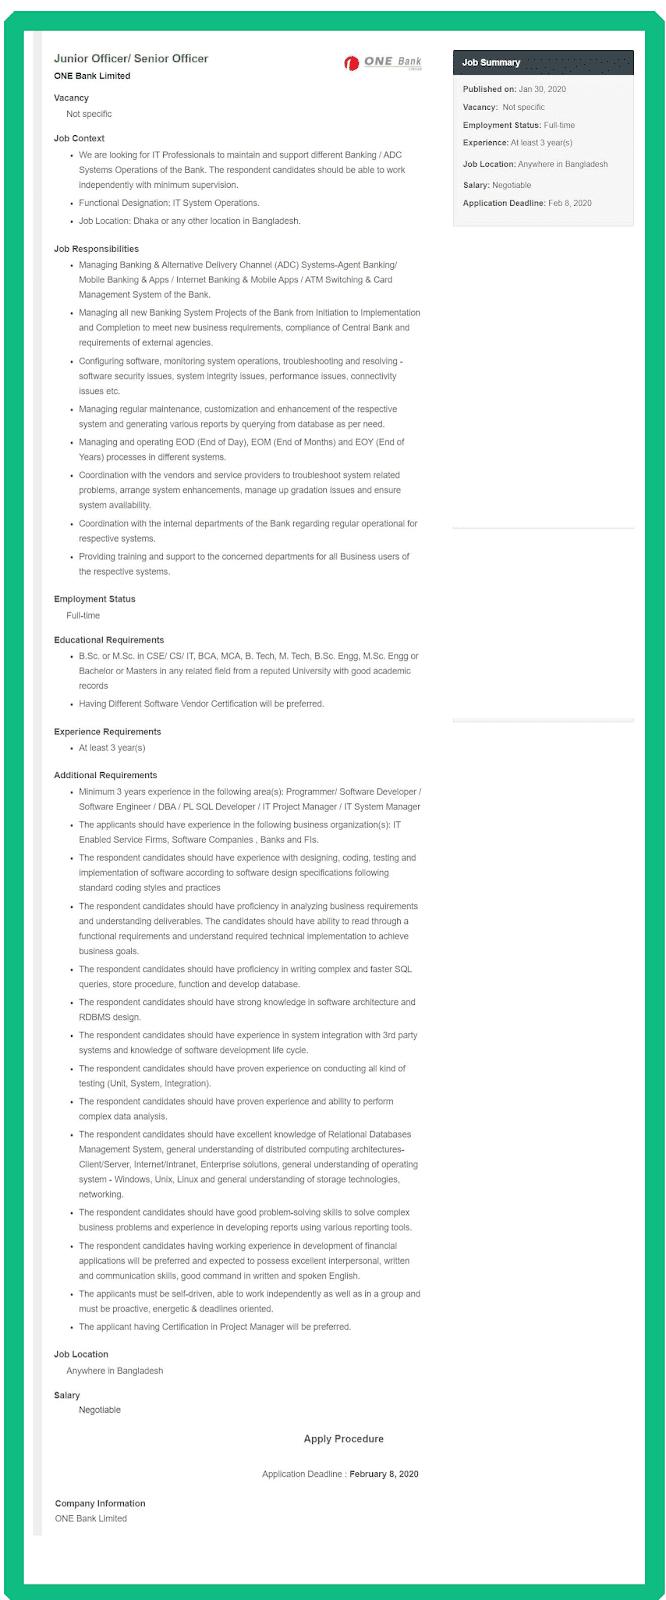 One Bank Ltd Job Circular 2020